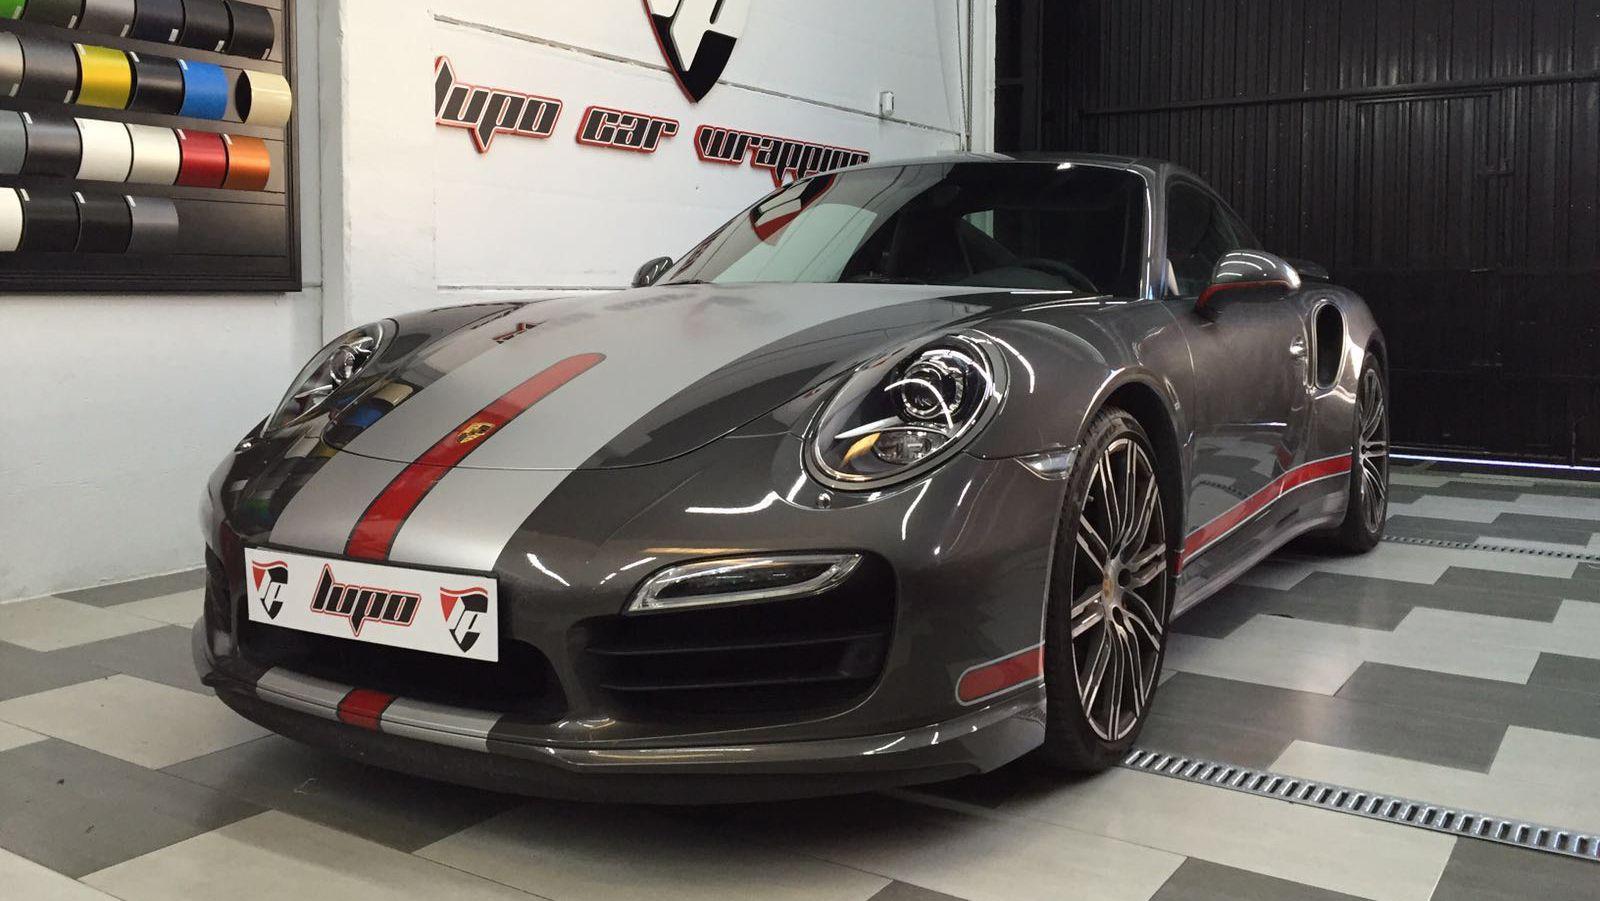 Porsche 911 turbo dise o franjas rojo y gris lupo car - Porche diseno ...